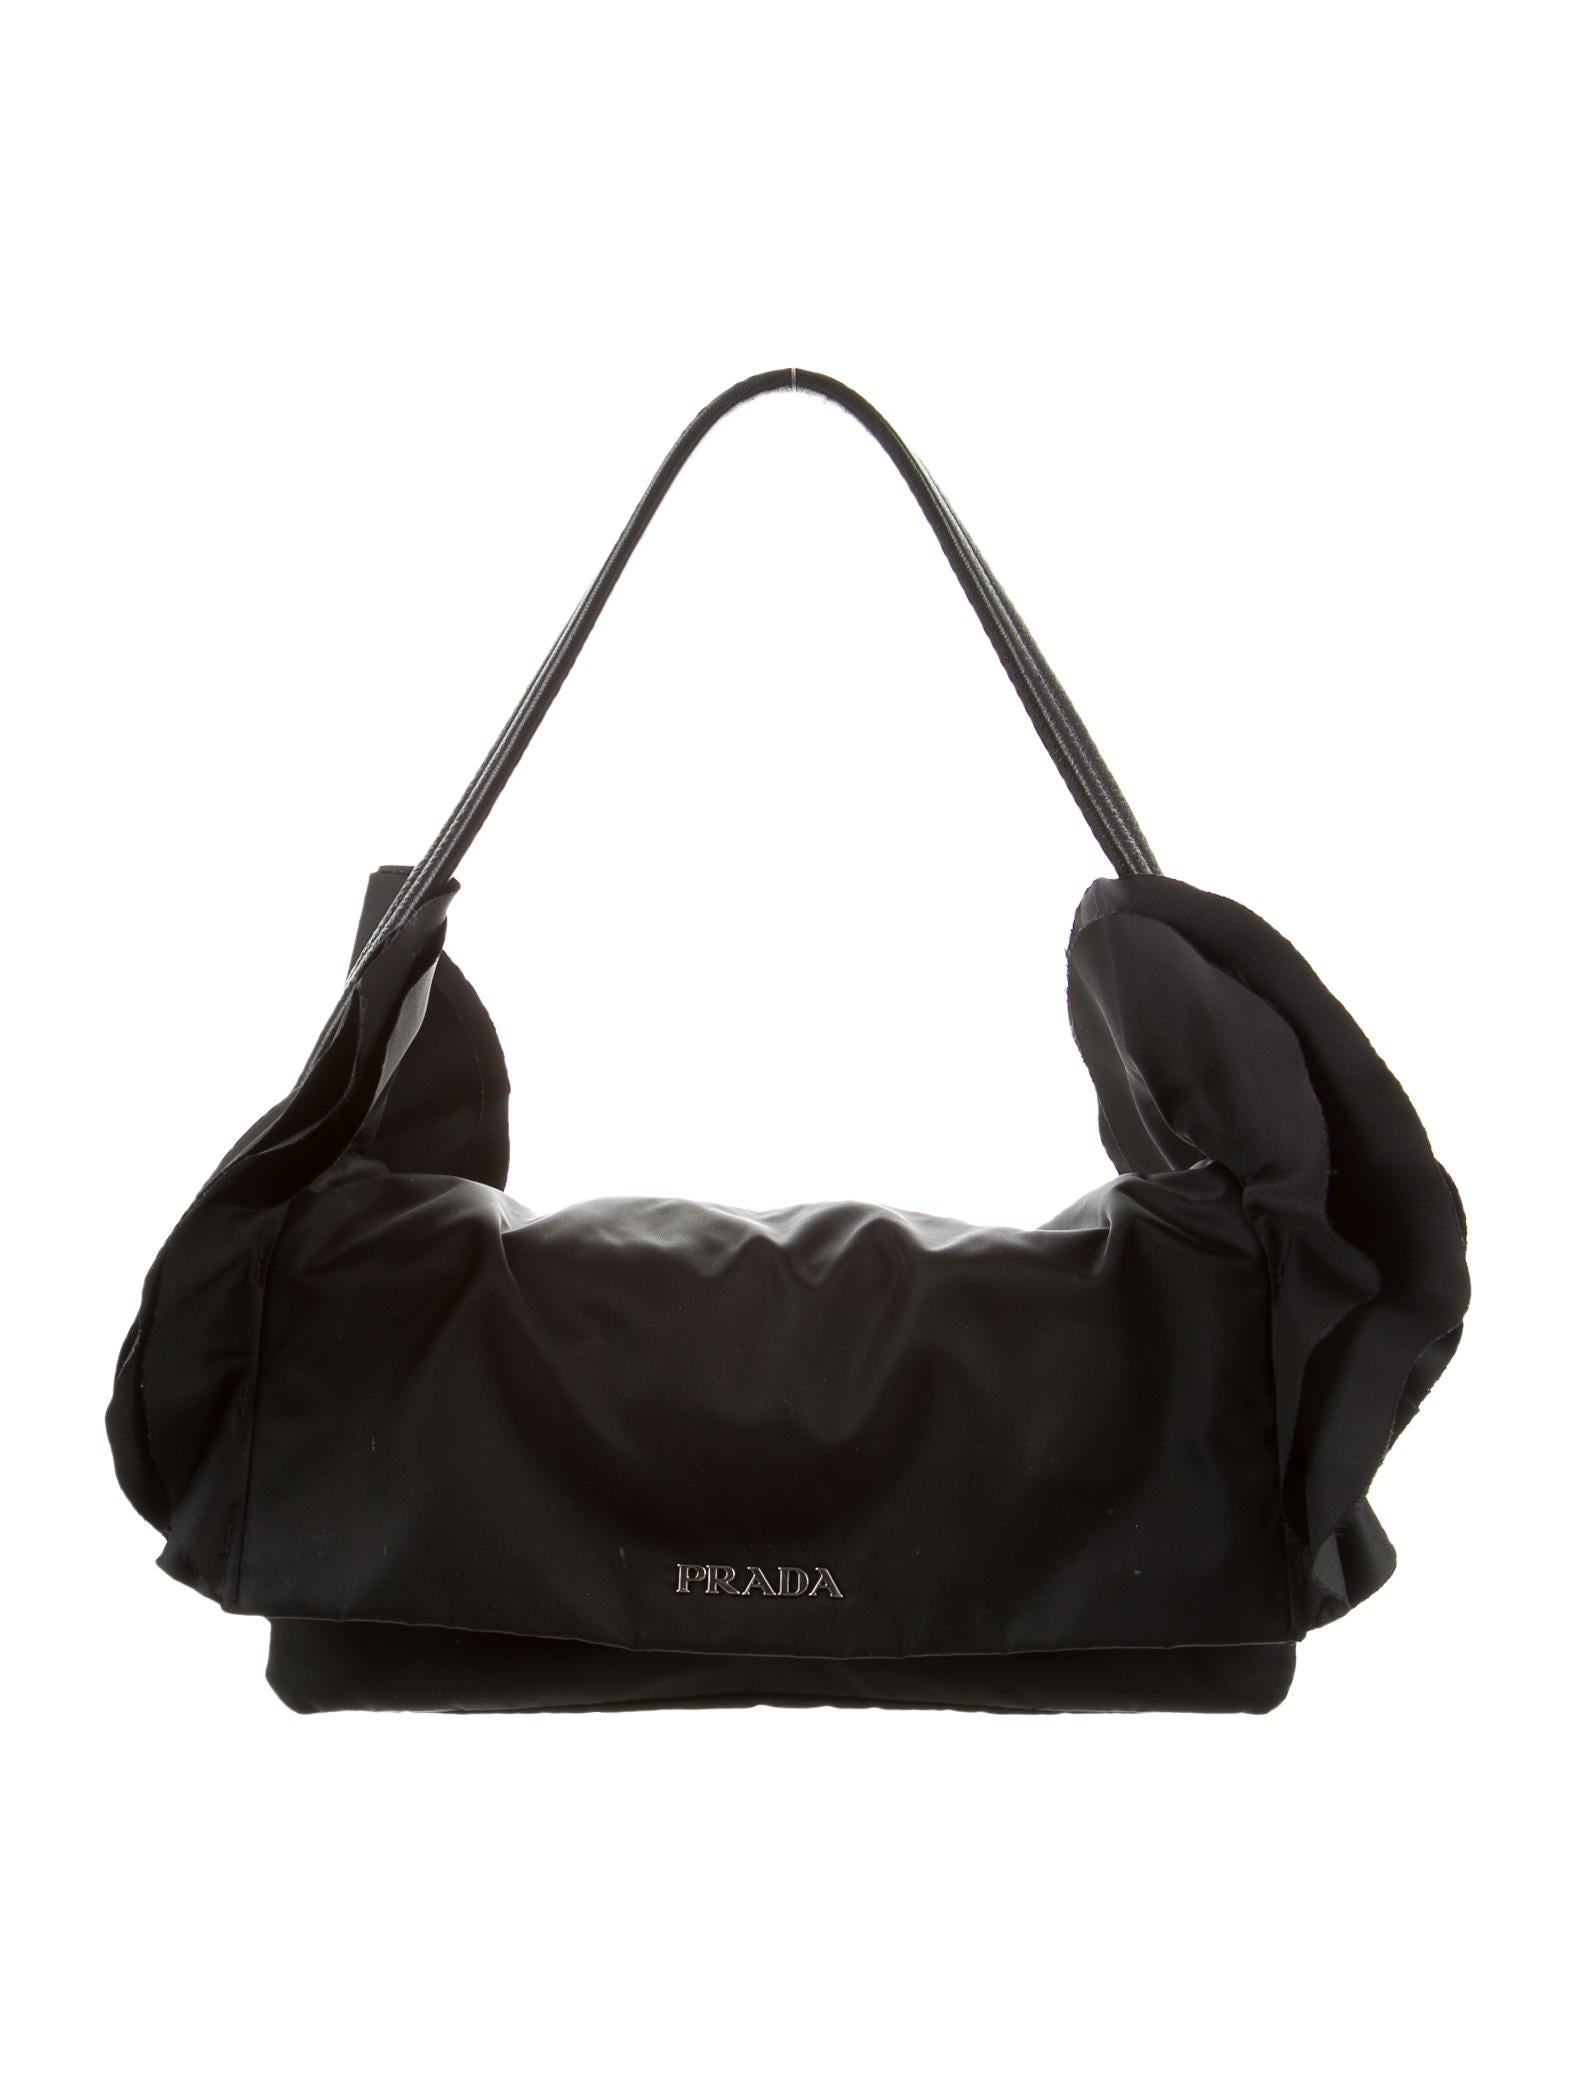 prada bags discount - prada tessuto leather handle bag, prada small leather goods